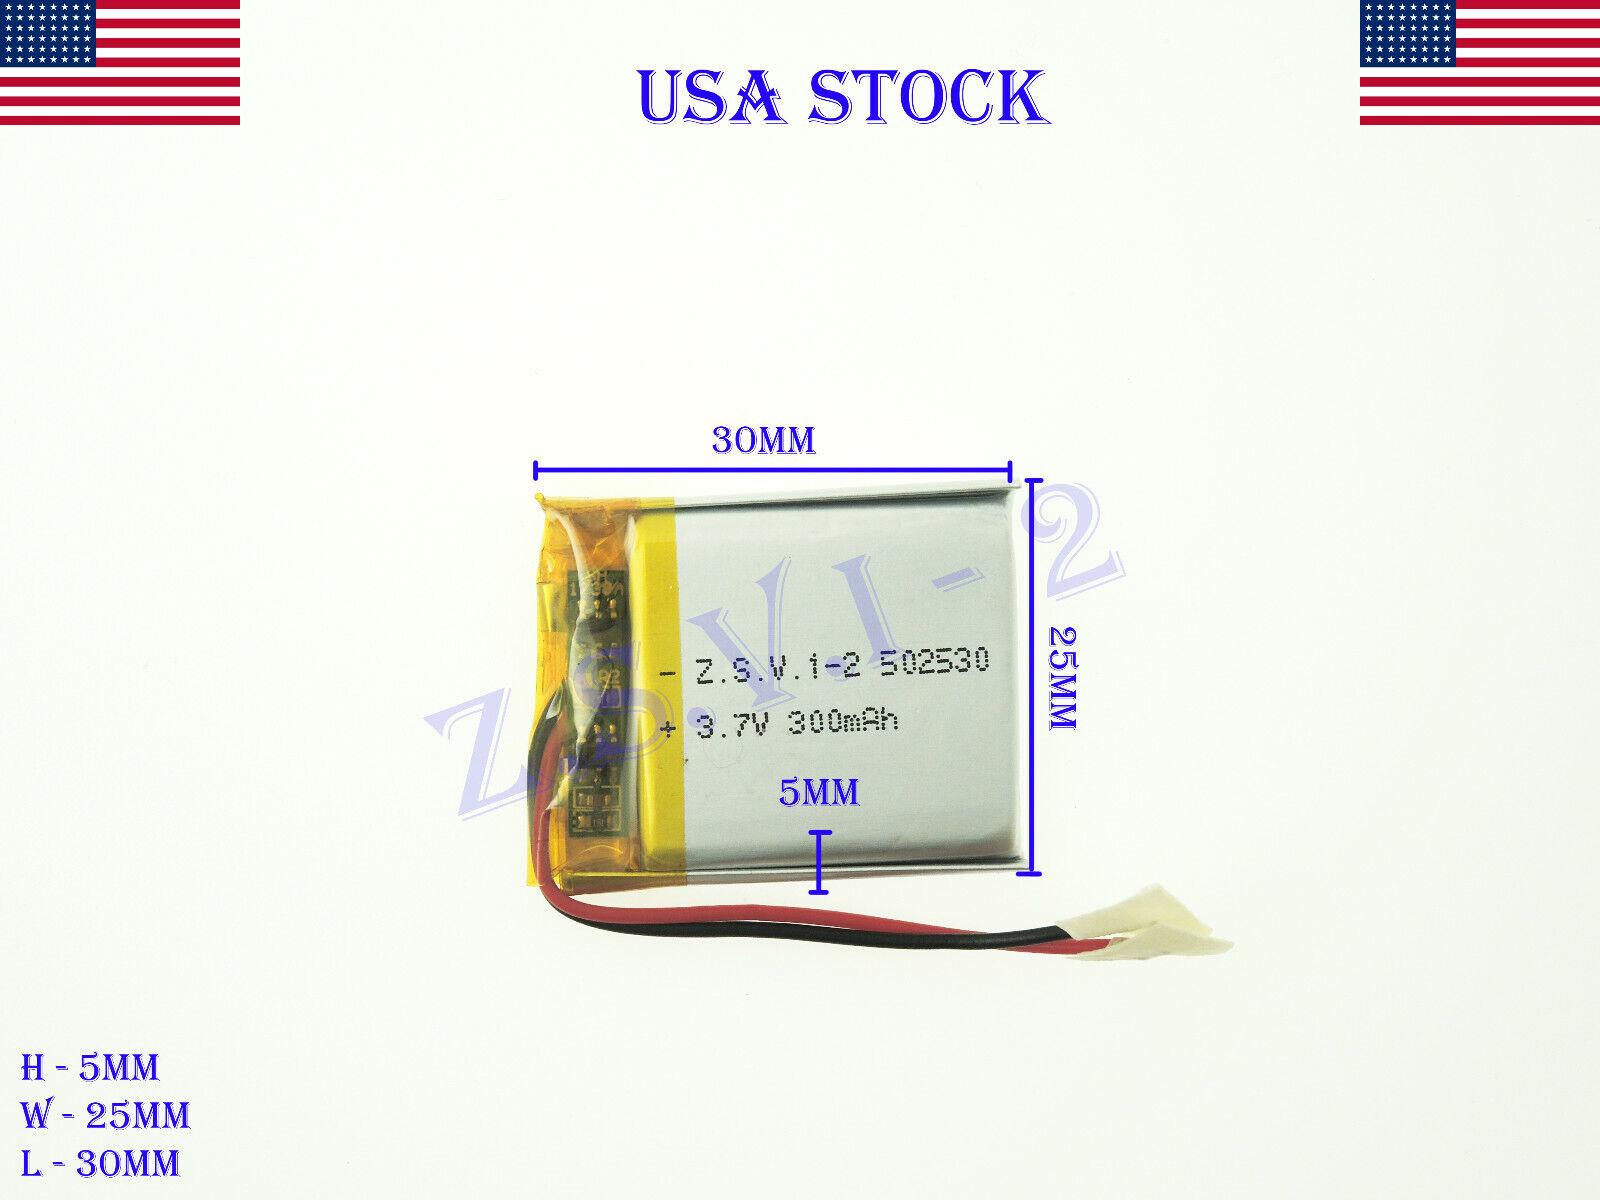 3.7V 300mAh 502530 Lithium Polymer Li-Po Rechargeable Battery (USA STOCK)